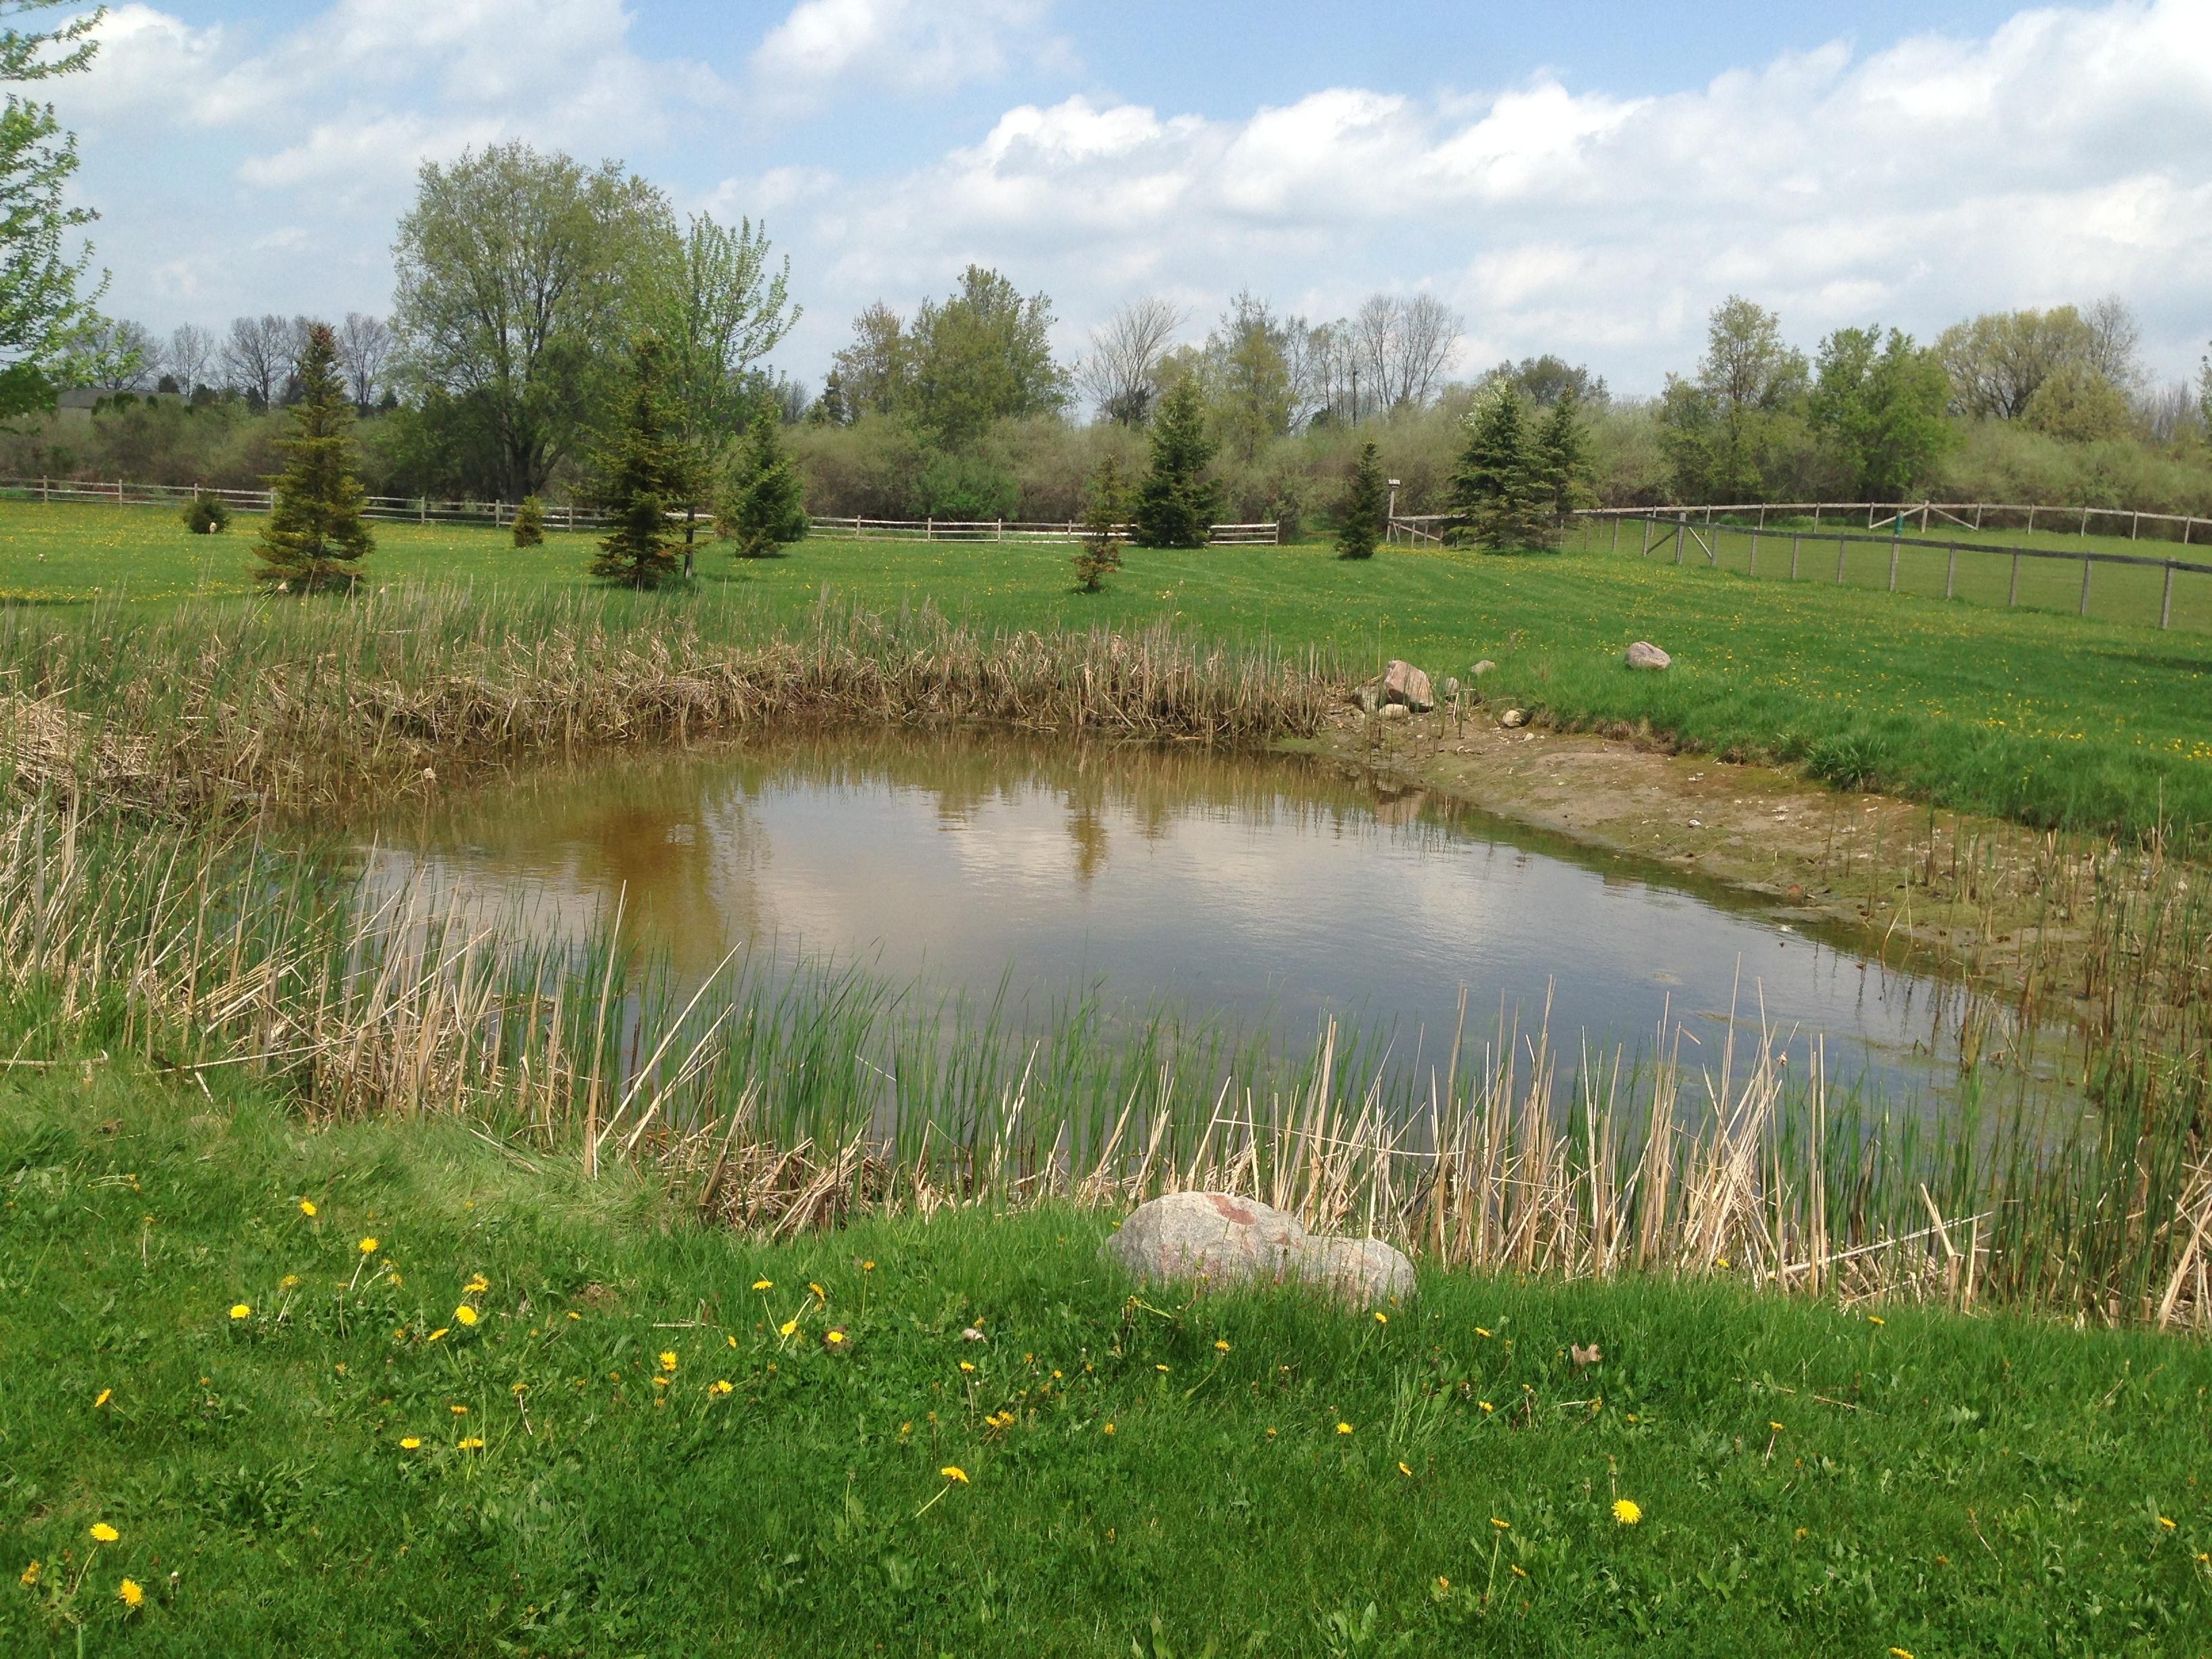 _Backyard_pond_bank_stabilization_Michigan_Howell.jpg